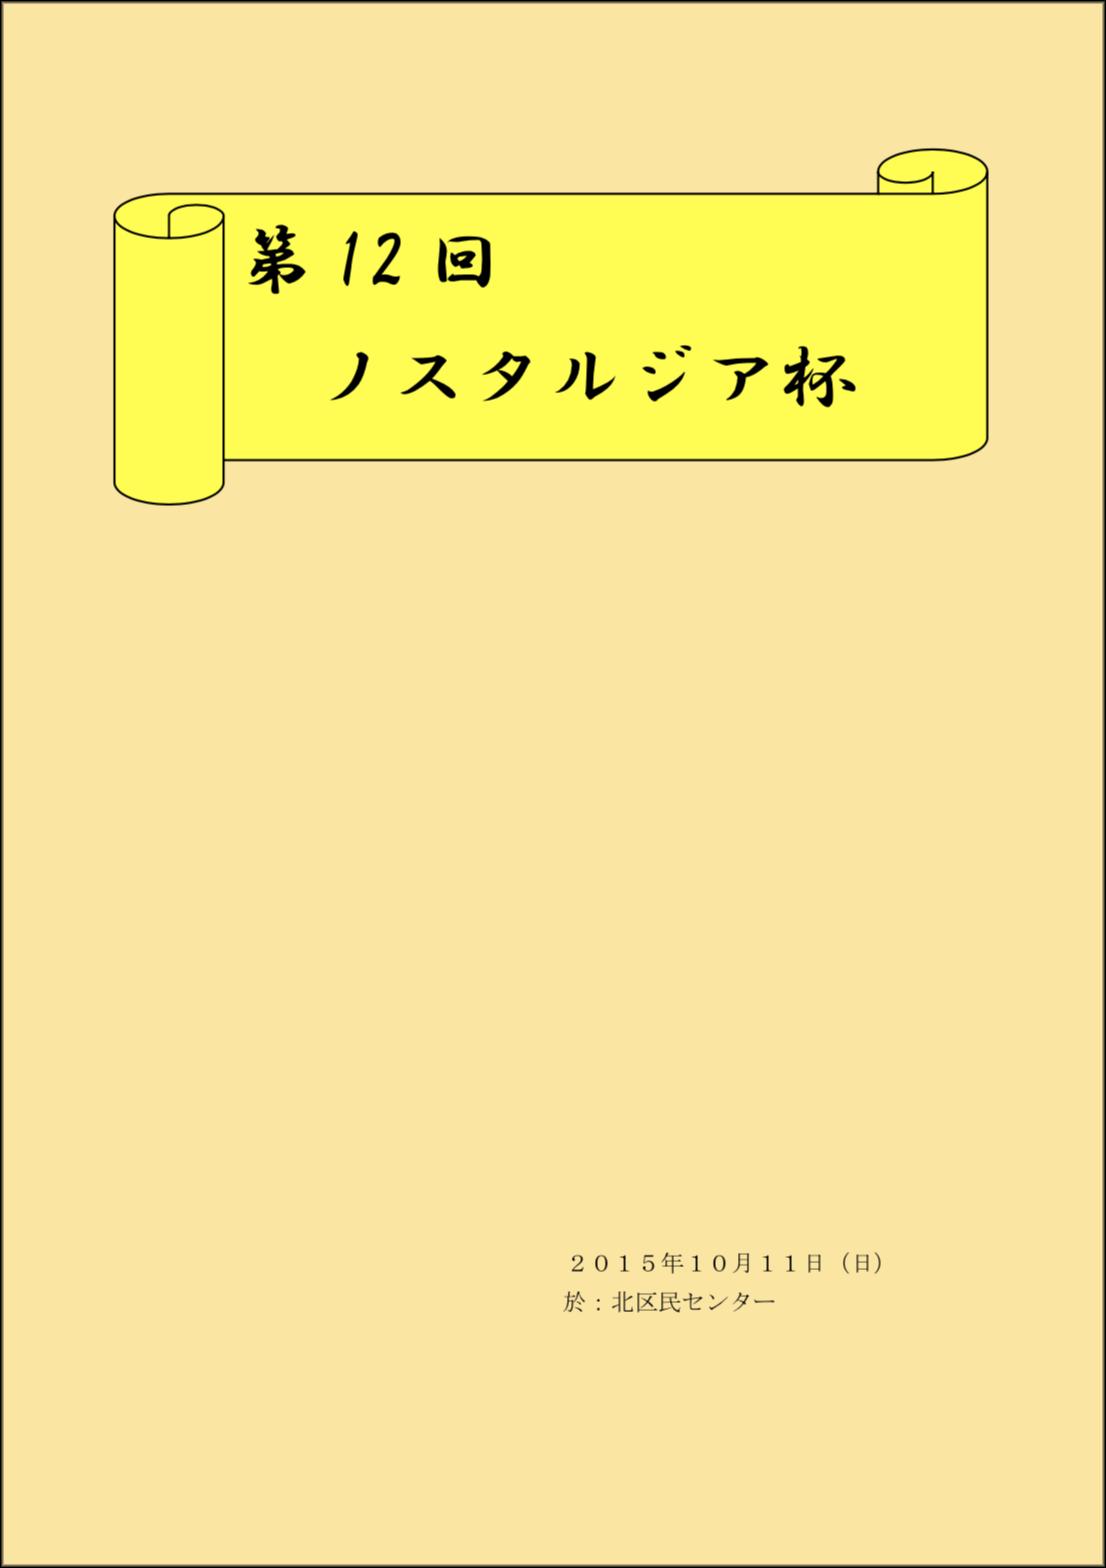 C31101271